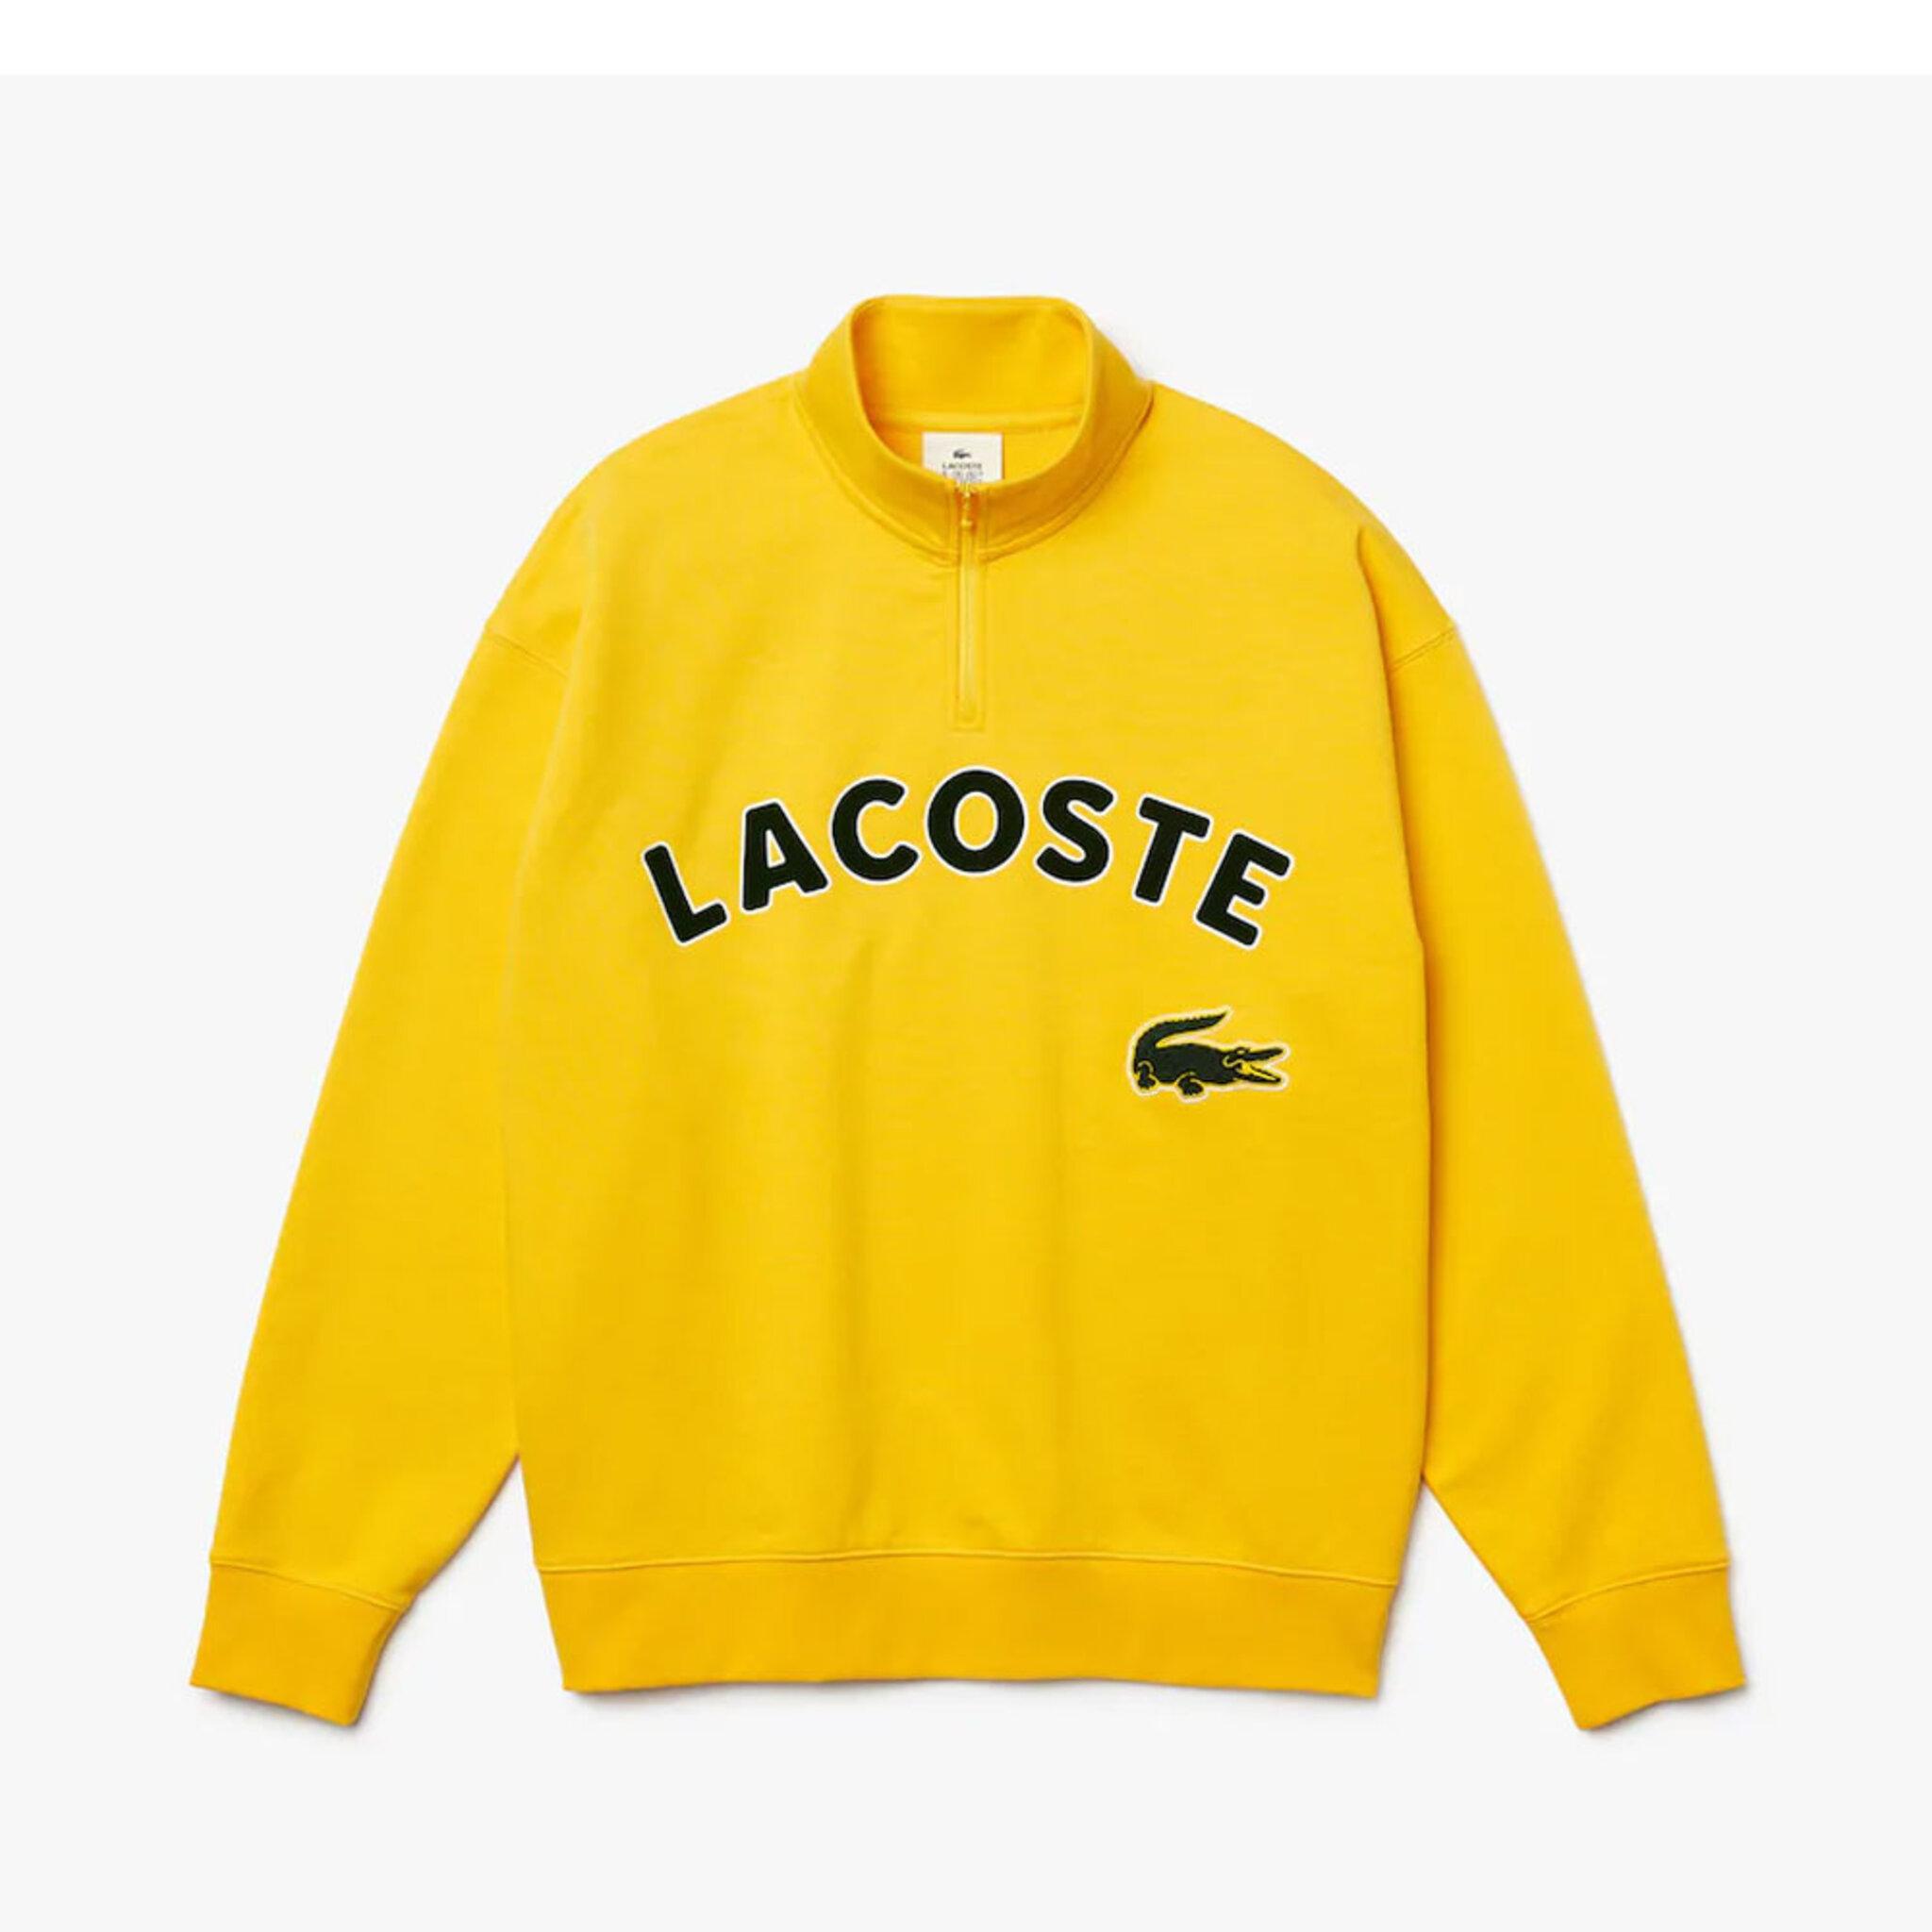 Branded Cotton Fleece Sweatshirt